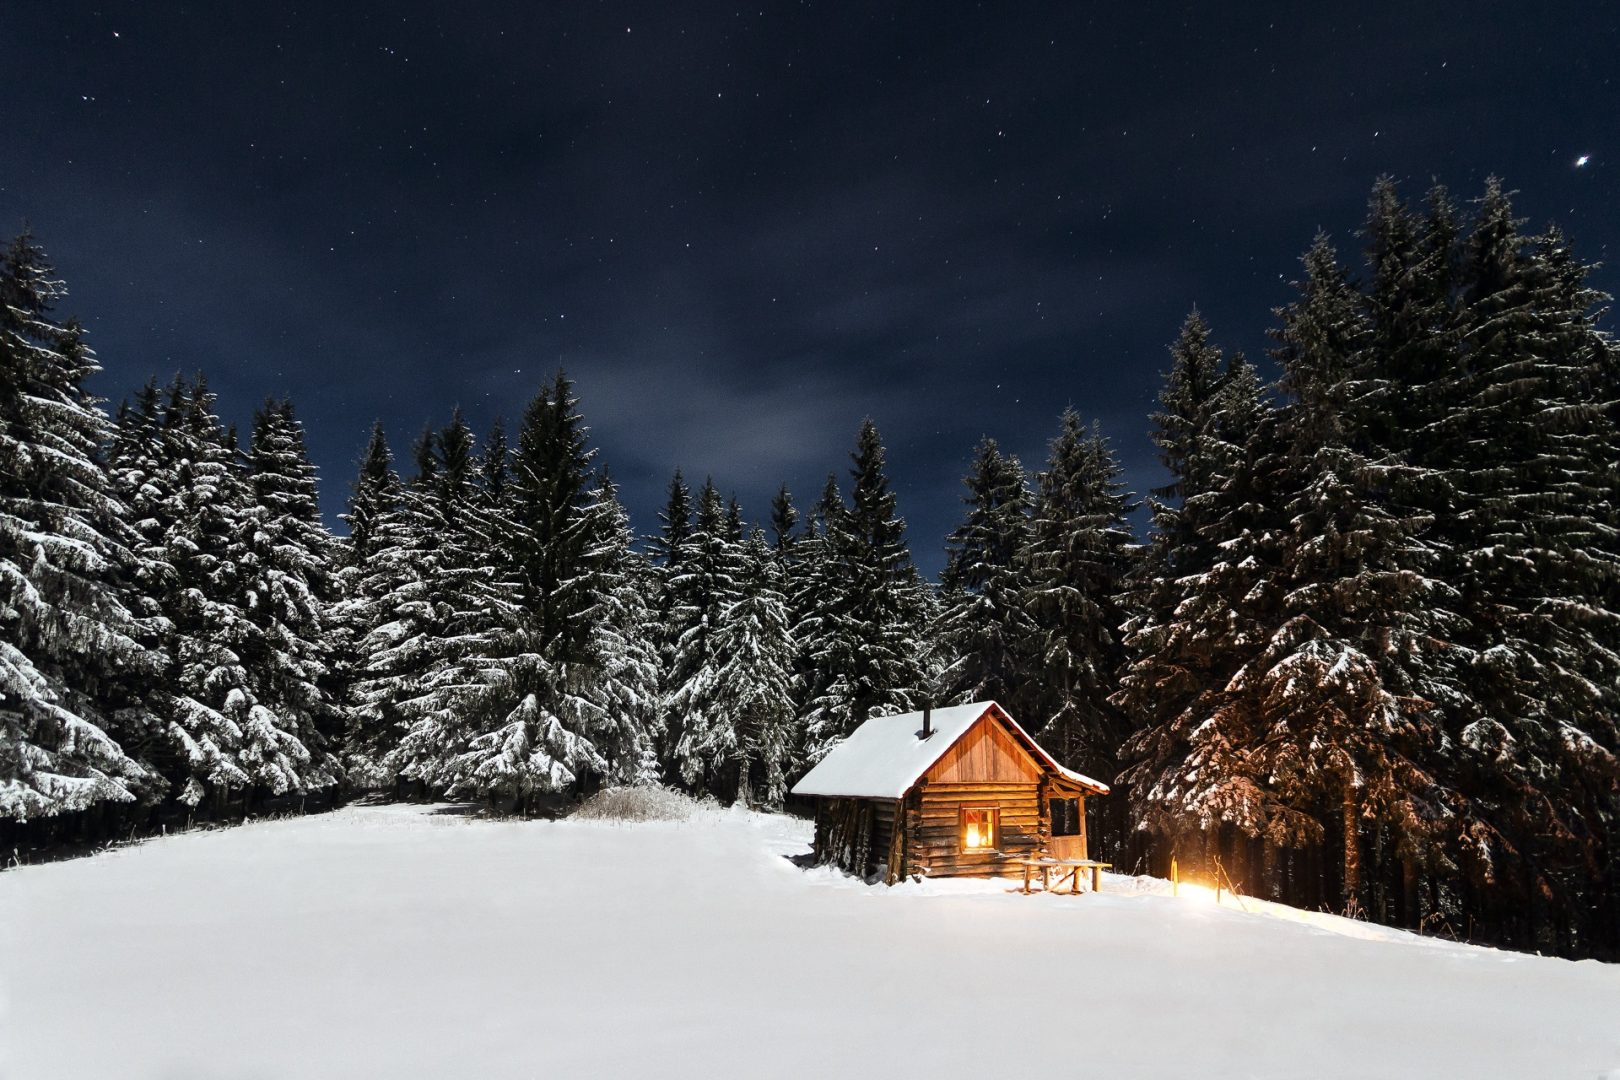 Spectacular Winter Wonderlands To Consider Visiting This December